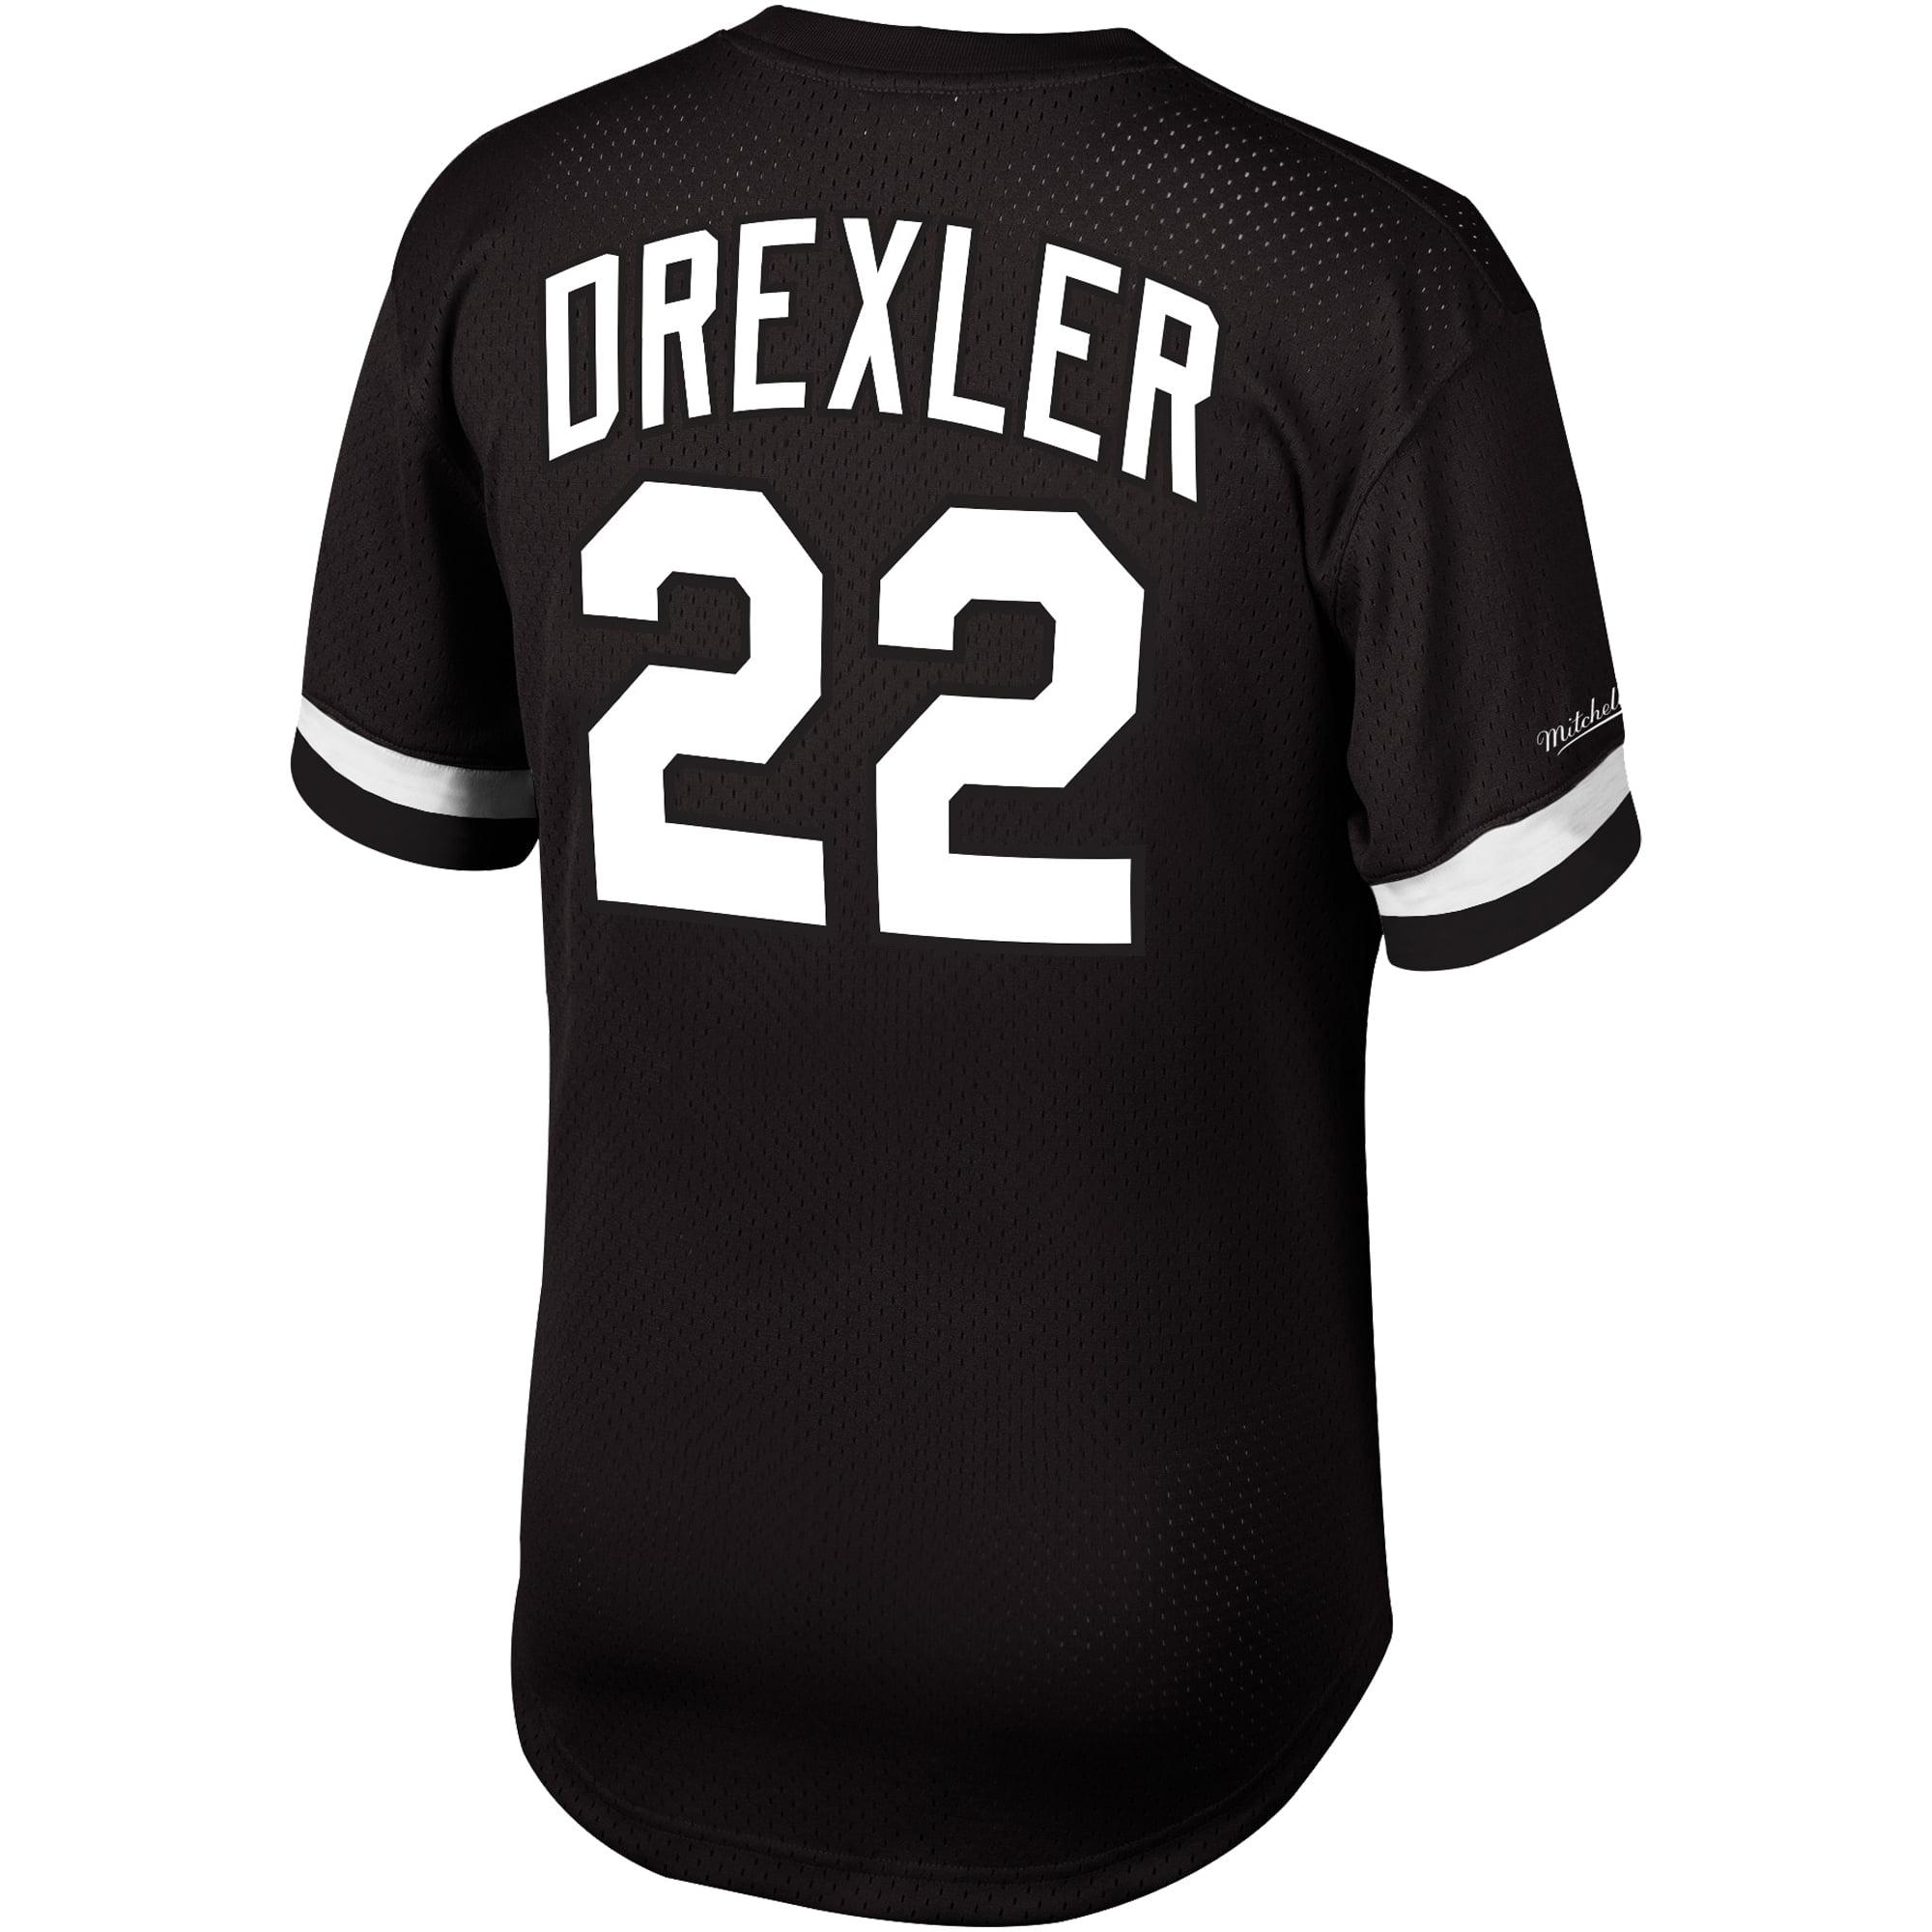 NBA Portland Trail Blazers Clyde Drexler Black /& White Mesh Name Number Crew